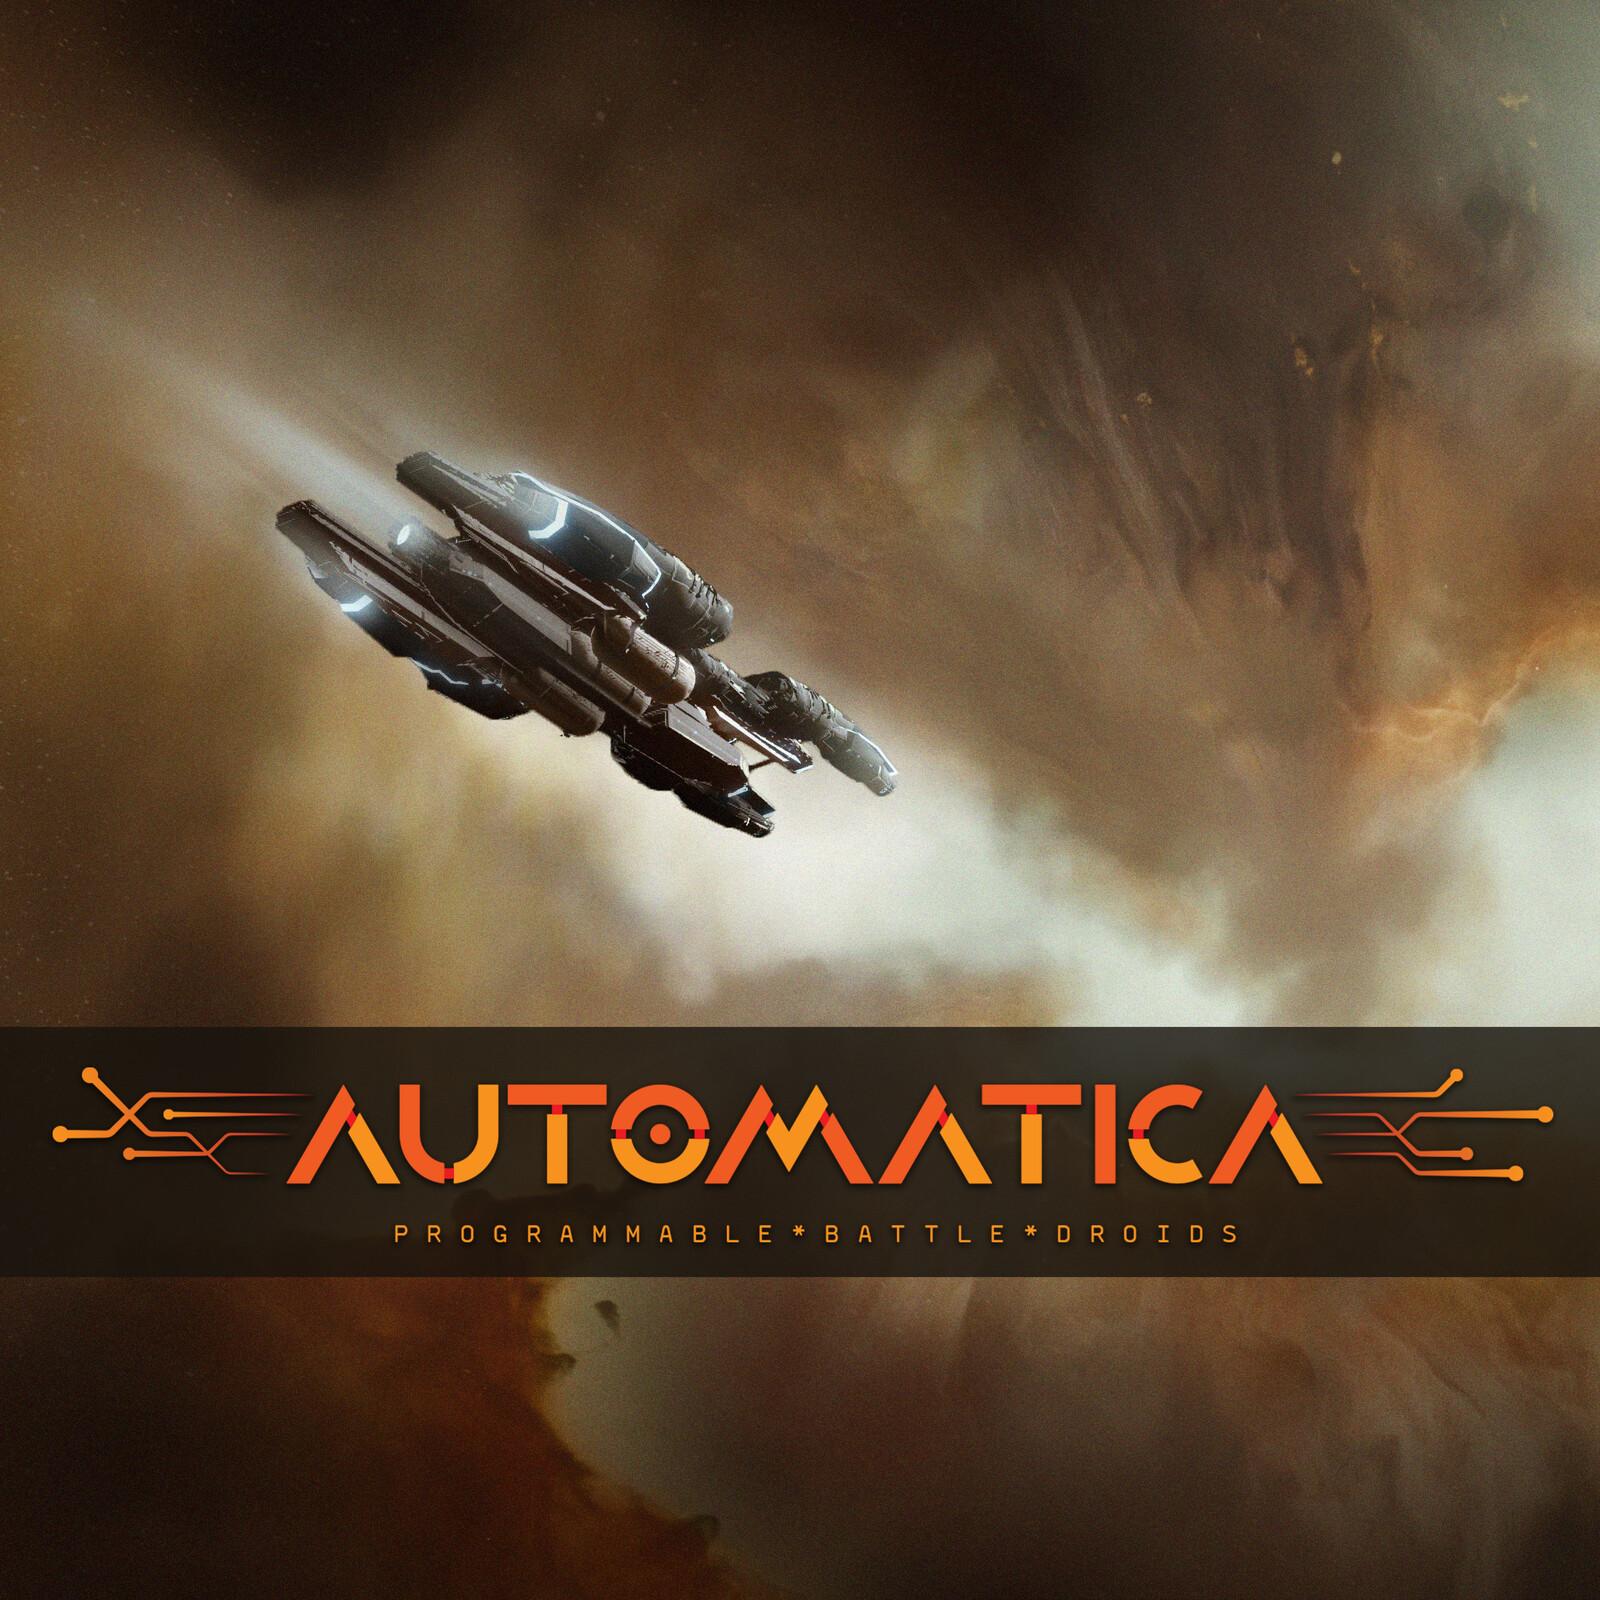 AUTOMATICA - KEY ART